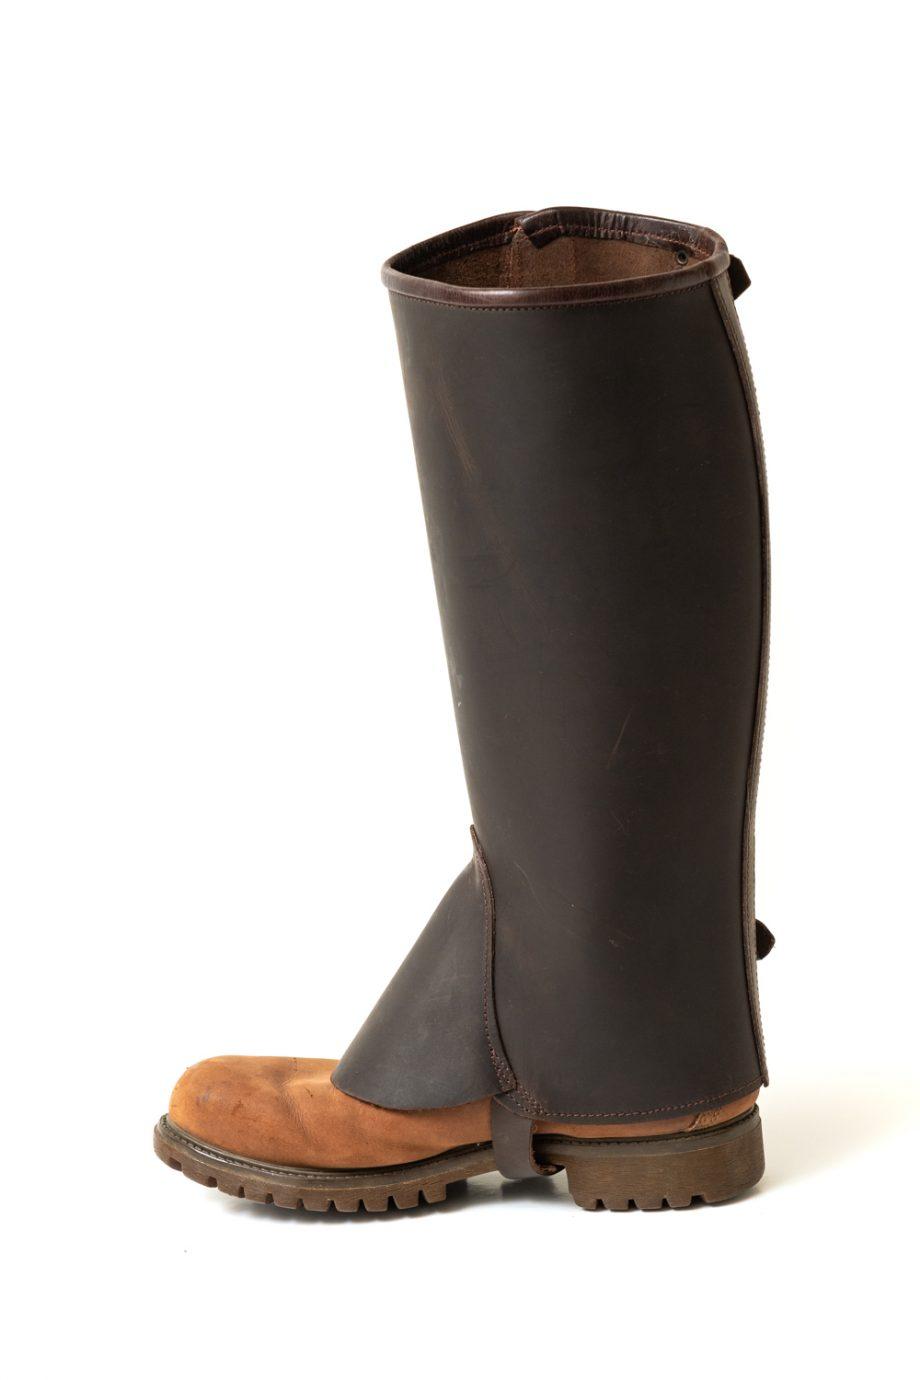 Leather mini chaps